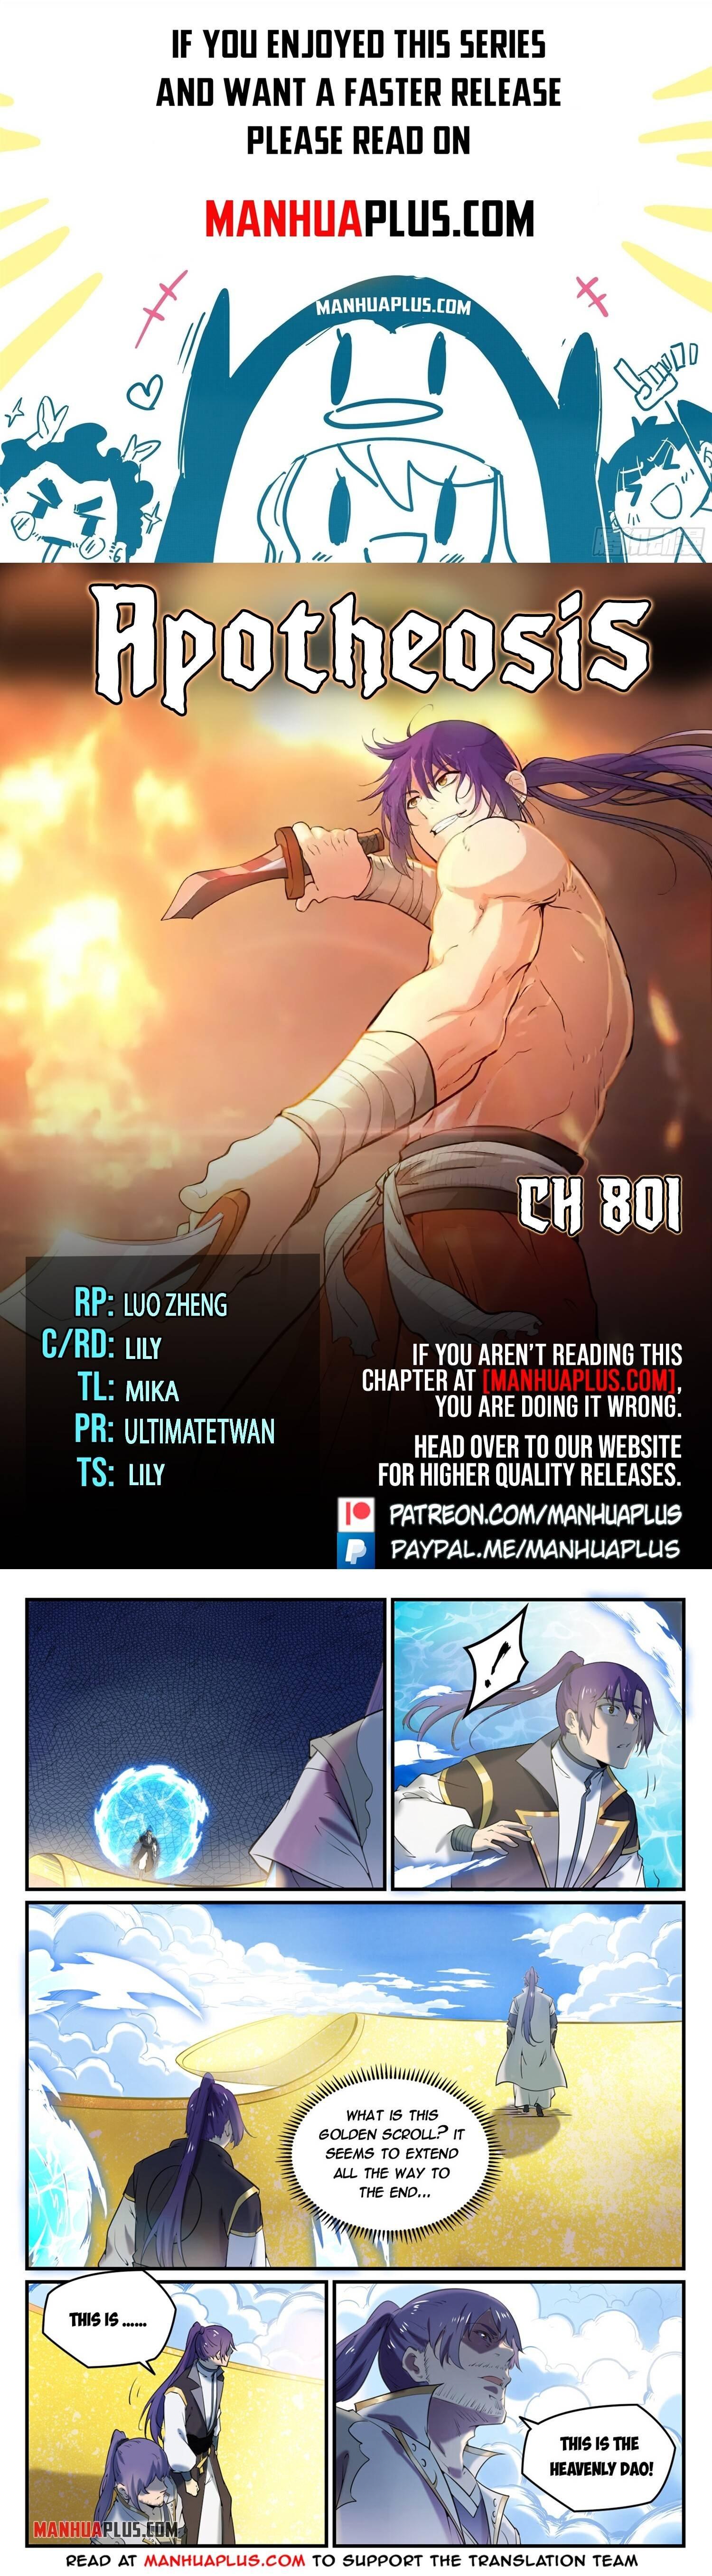 Manga Apotheosis - Chapter 801 Page 1